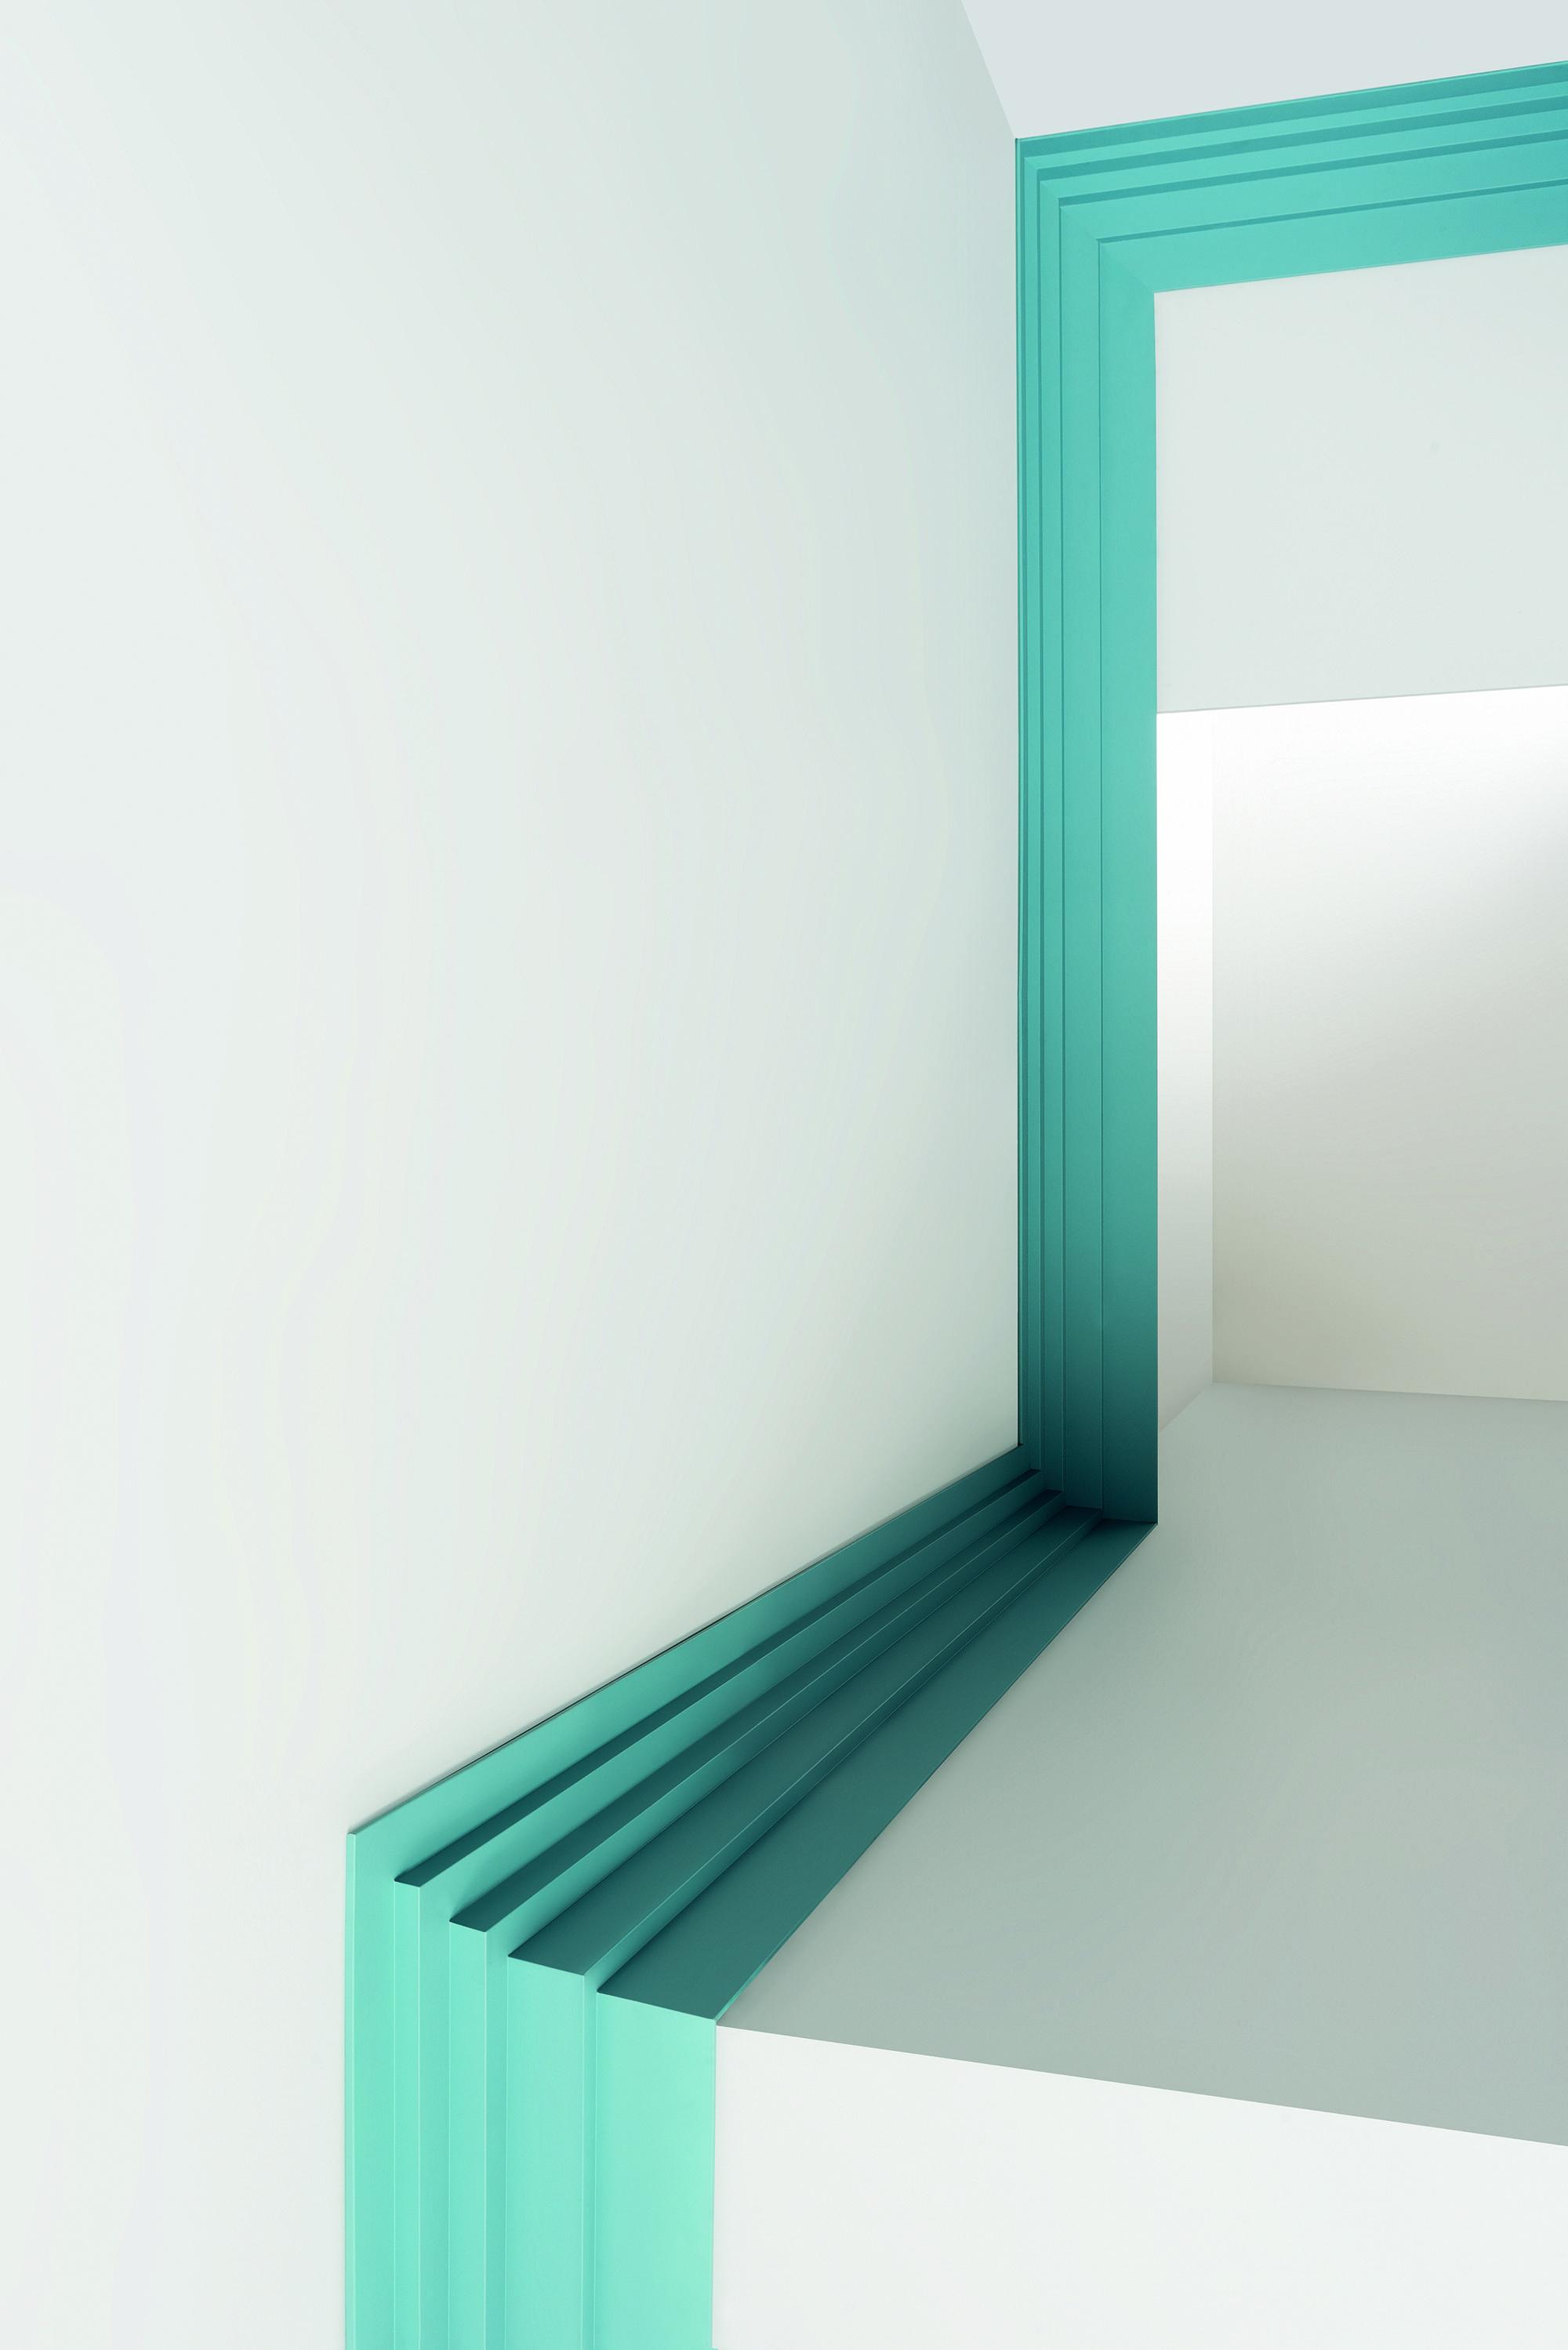 orac decor c373f ulf moritz luxxus flexible cornice moulding, Innenarchitektur ideen